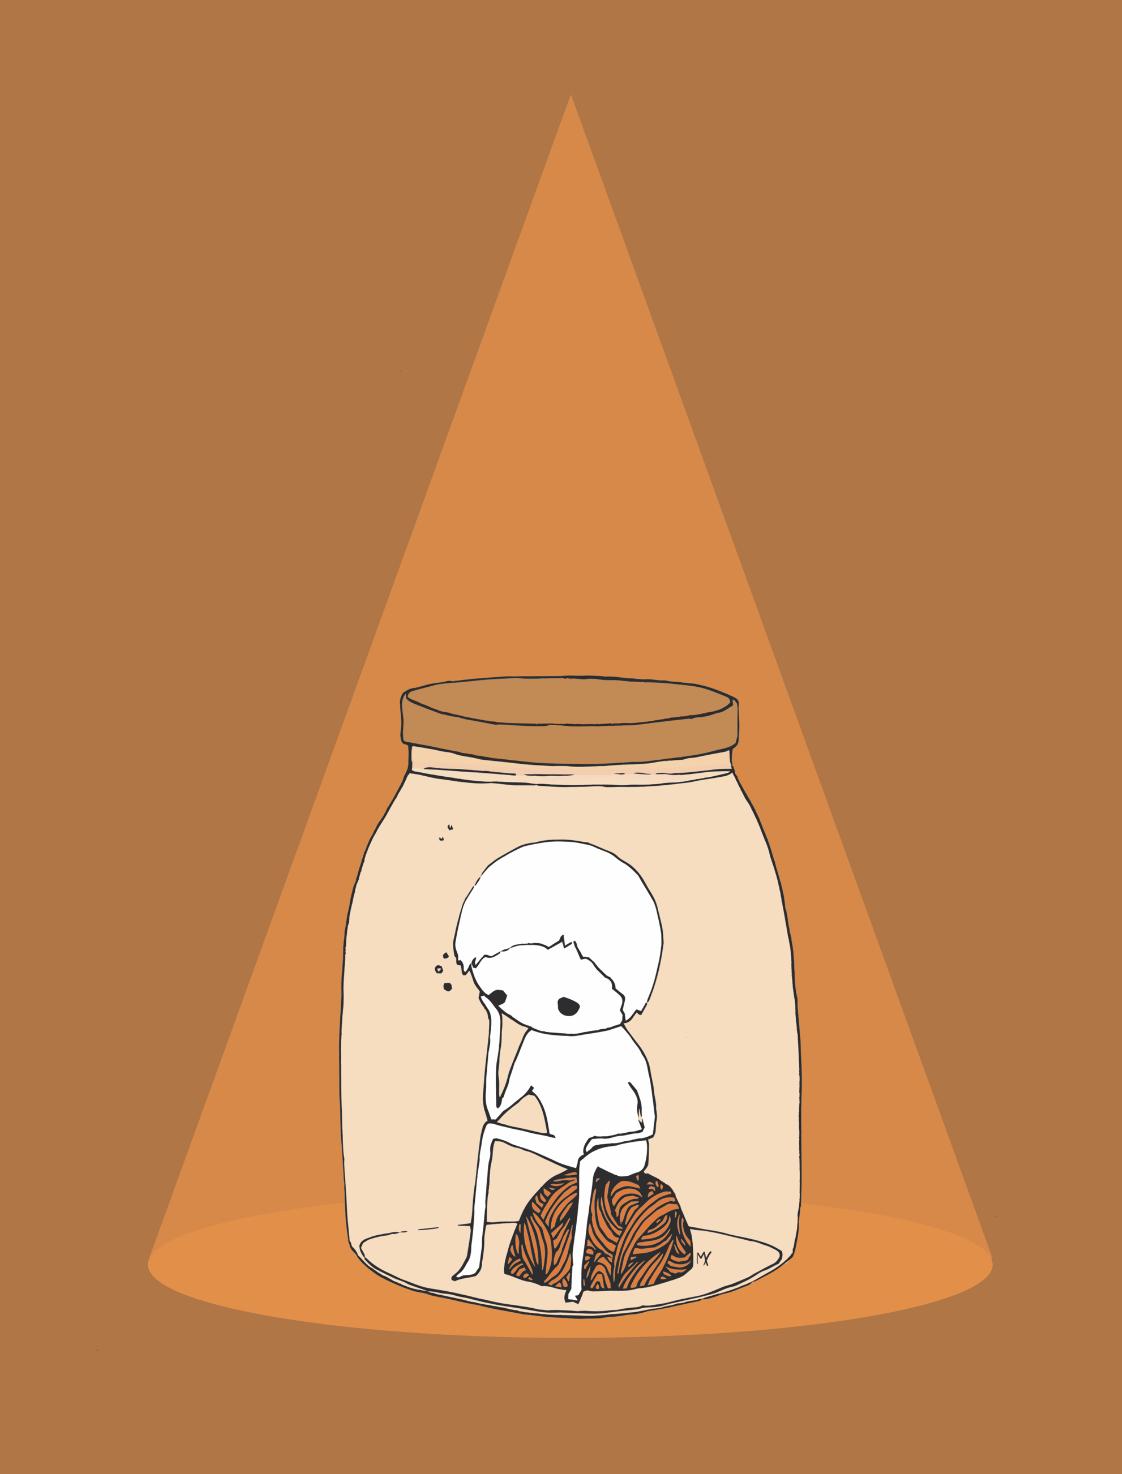 KinderUndJugendberatung_Illustration_orange_lichstrahl